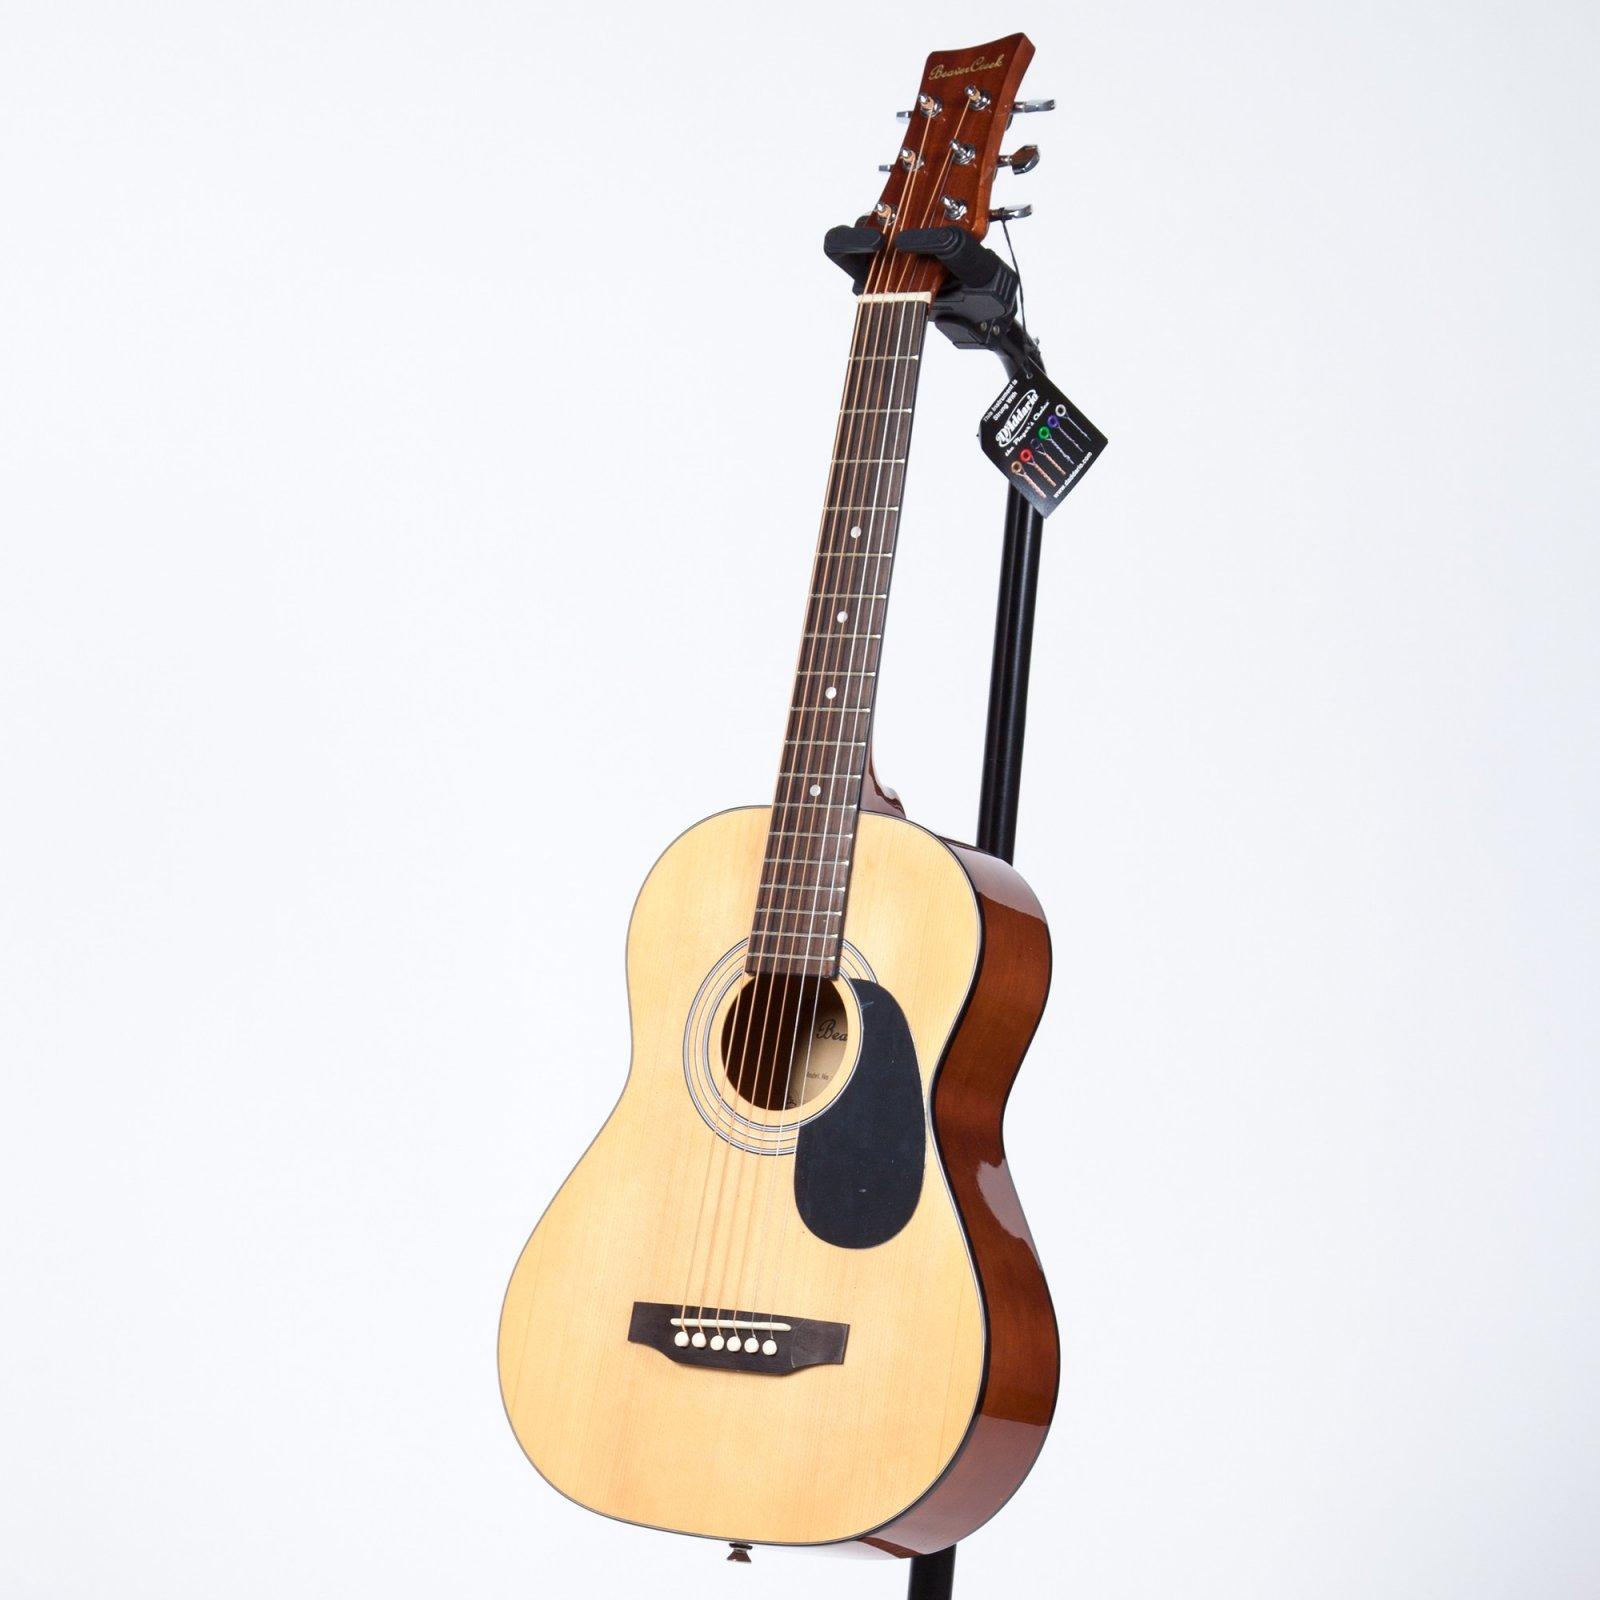 BEAVER CREEK 401 Series - 1/2 Size Acoustic